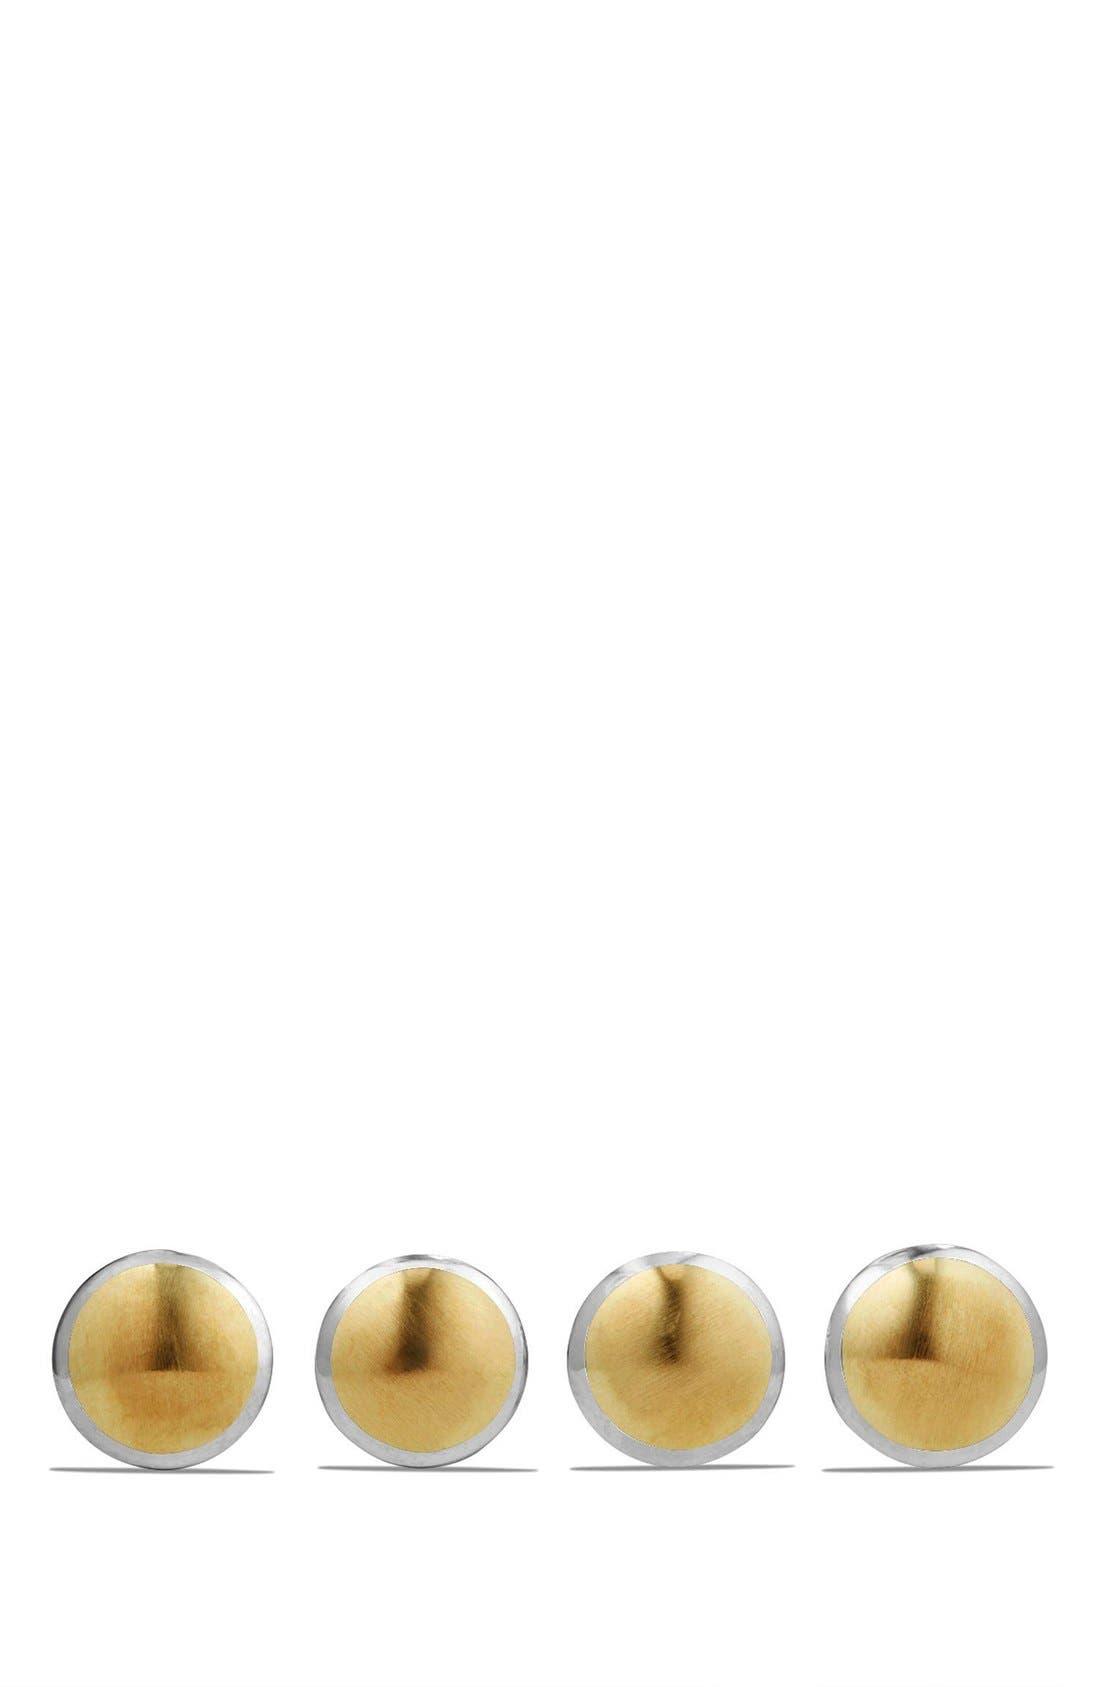 Main Image - David Yurman Streamline Set of 4 Shirt Studs with 18K Gold